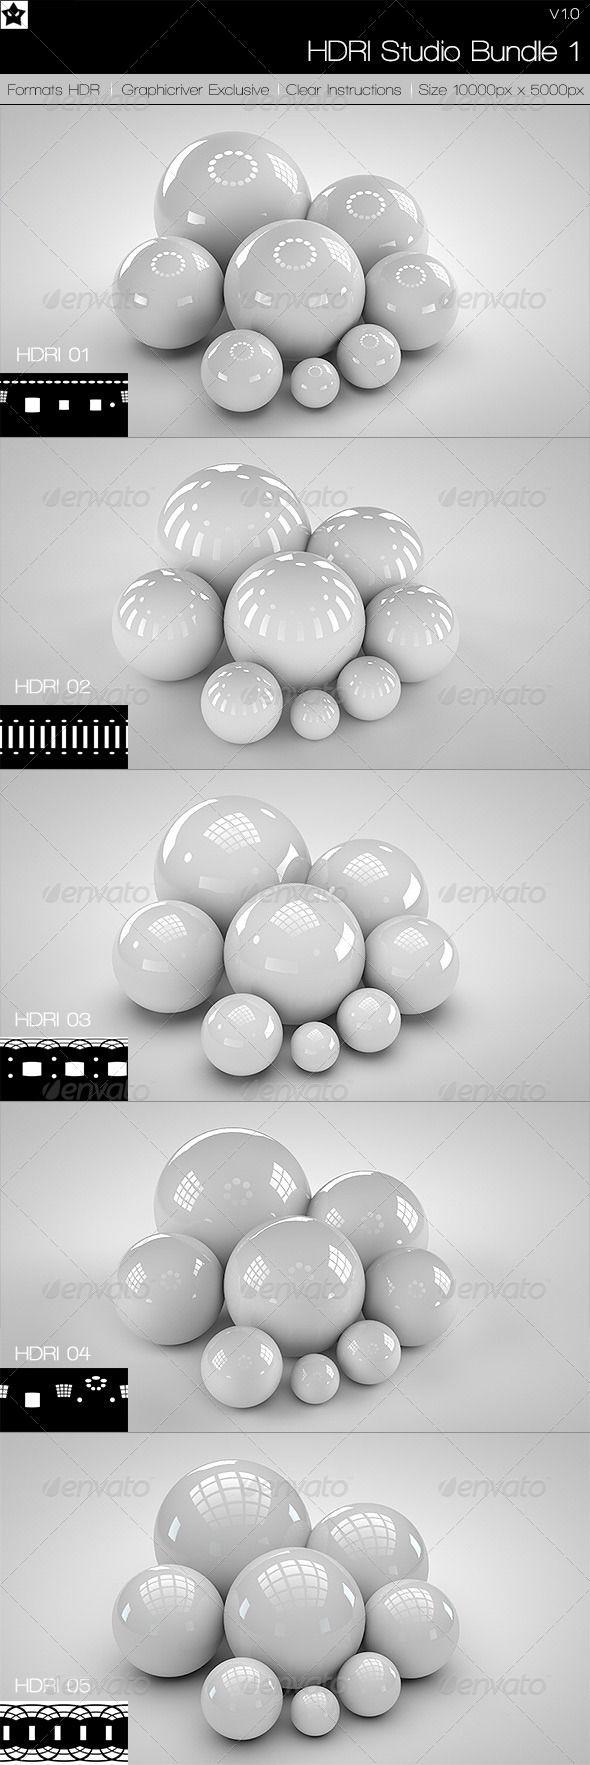 5 realistic Studio HDRI Budle 1 - 3DOcean Item for Sale